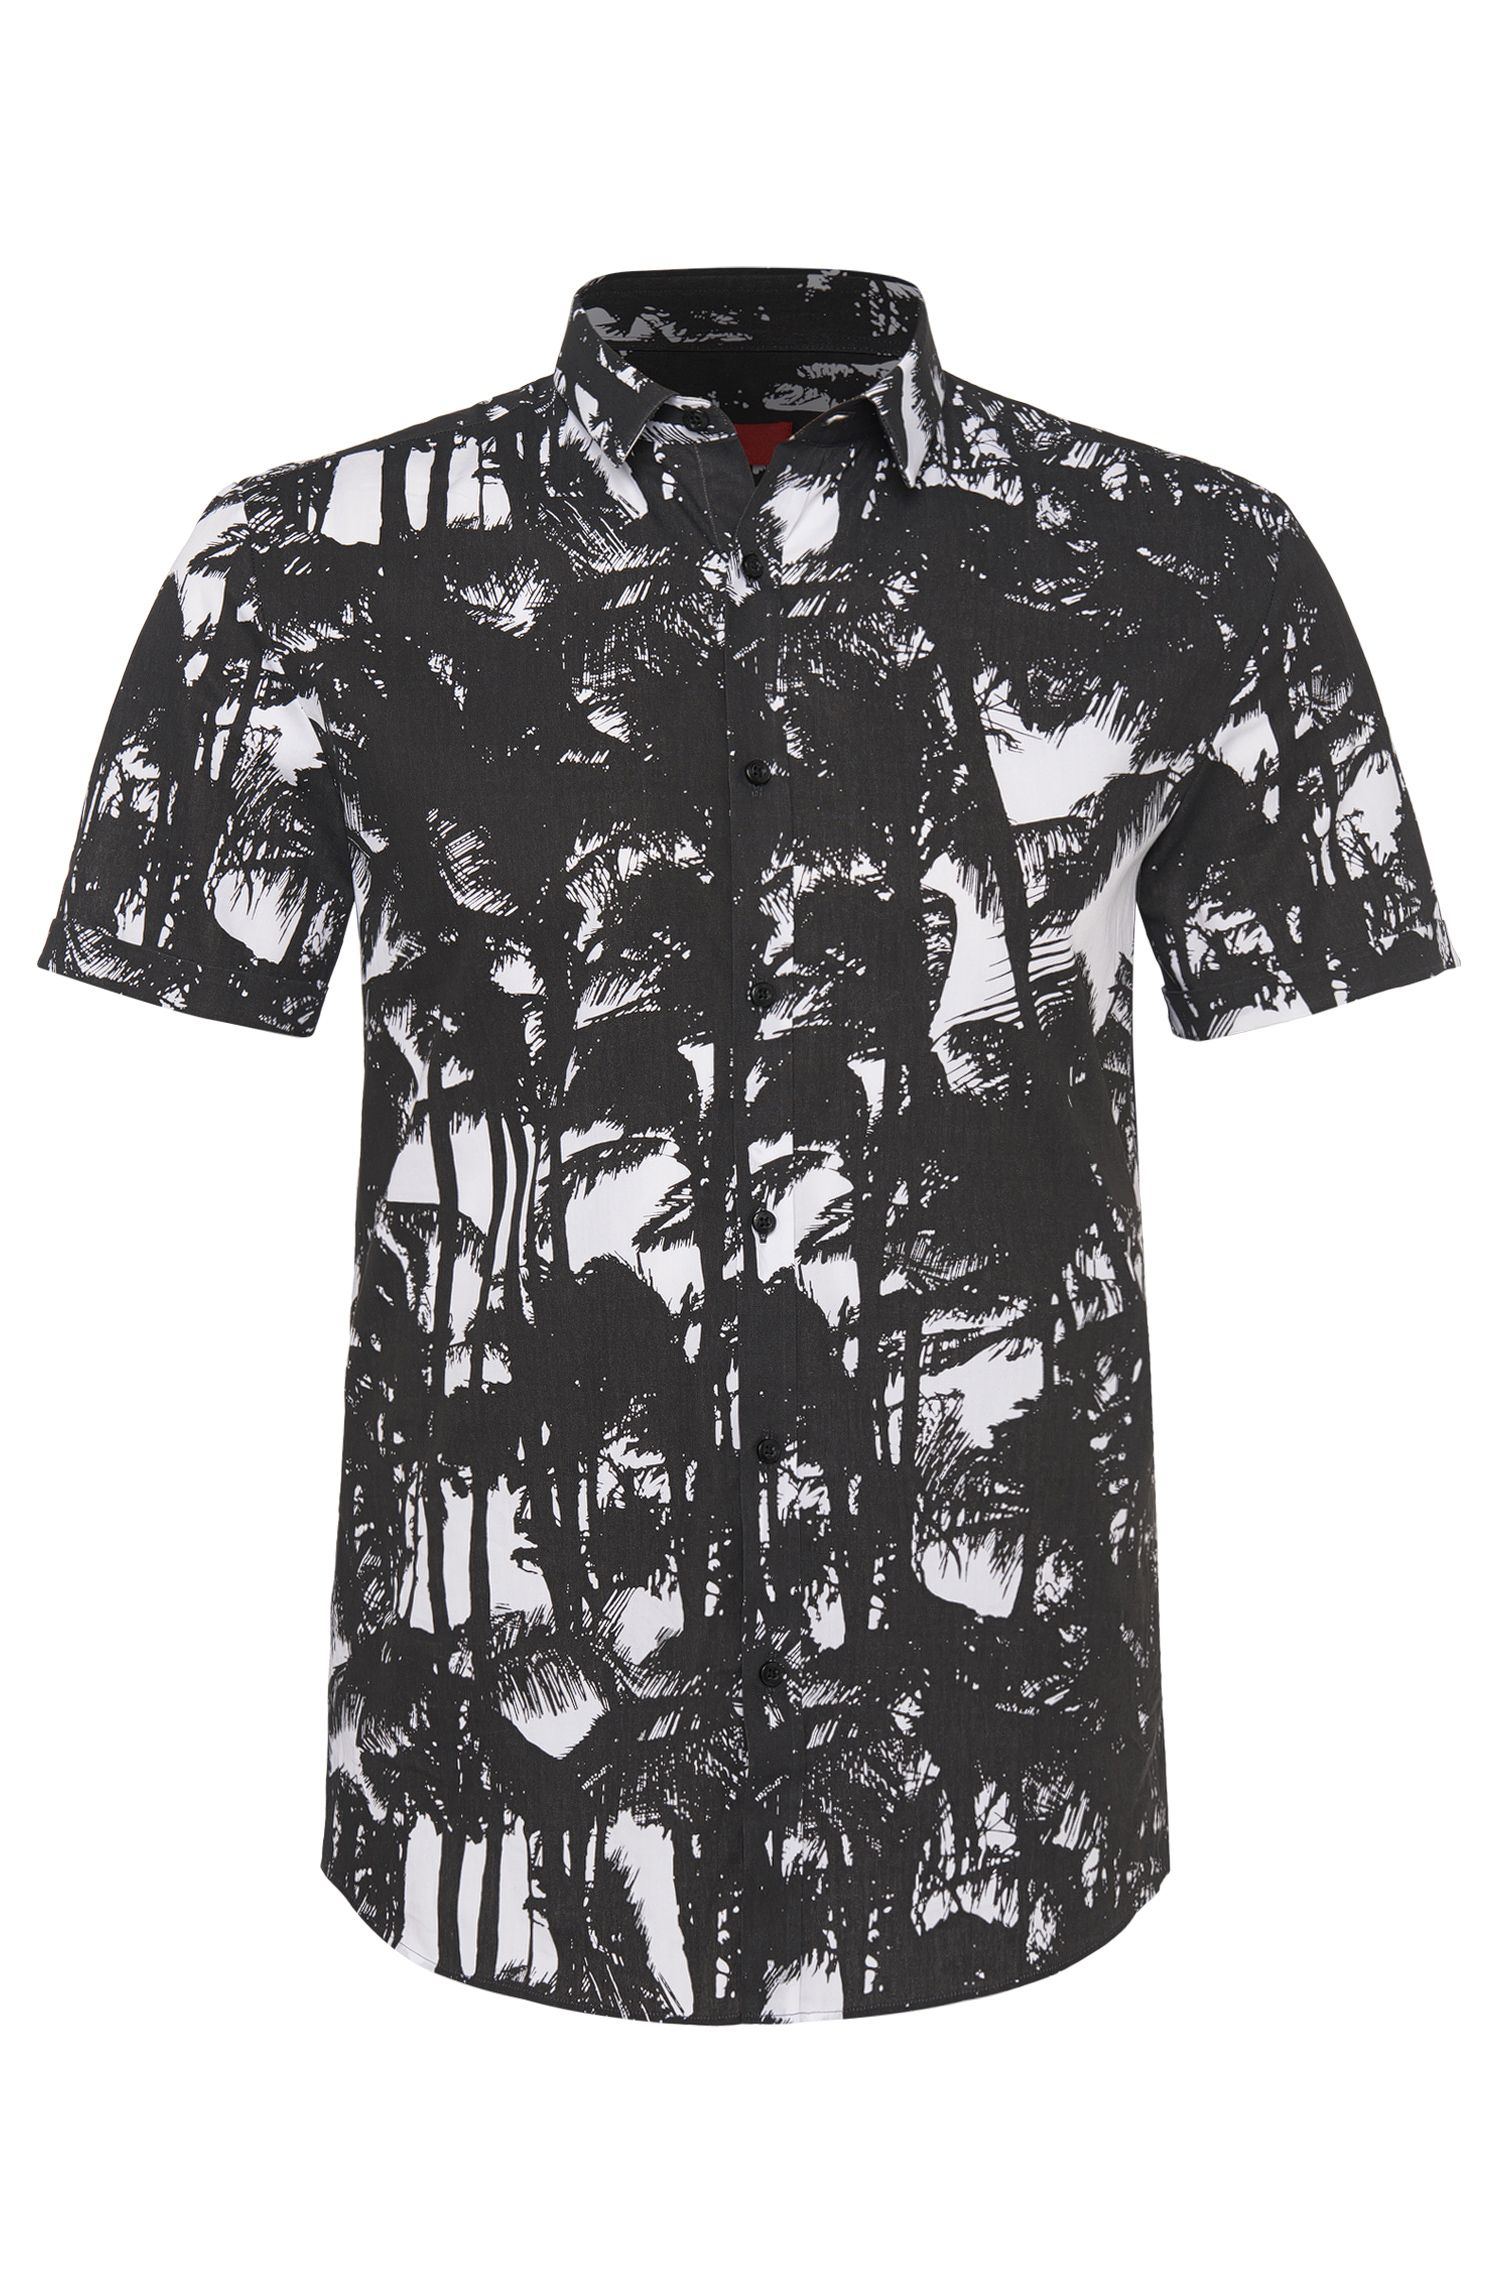 'Empson' | Slim Fit, Cotton Printed Button Down Shirt